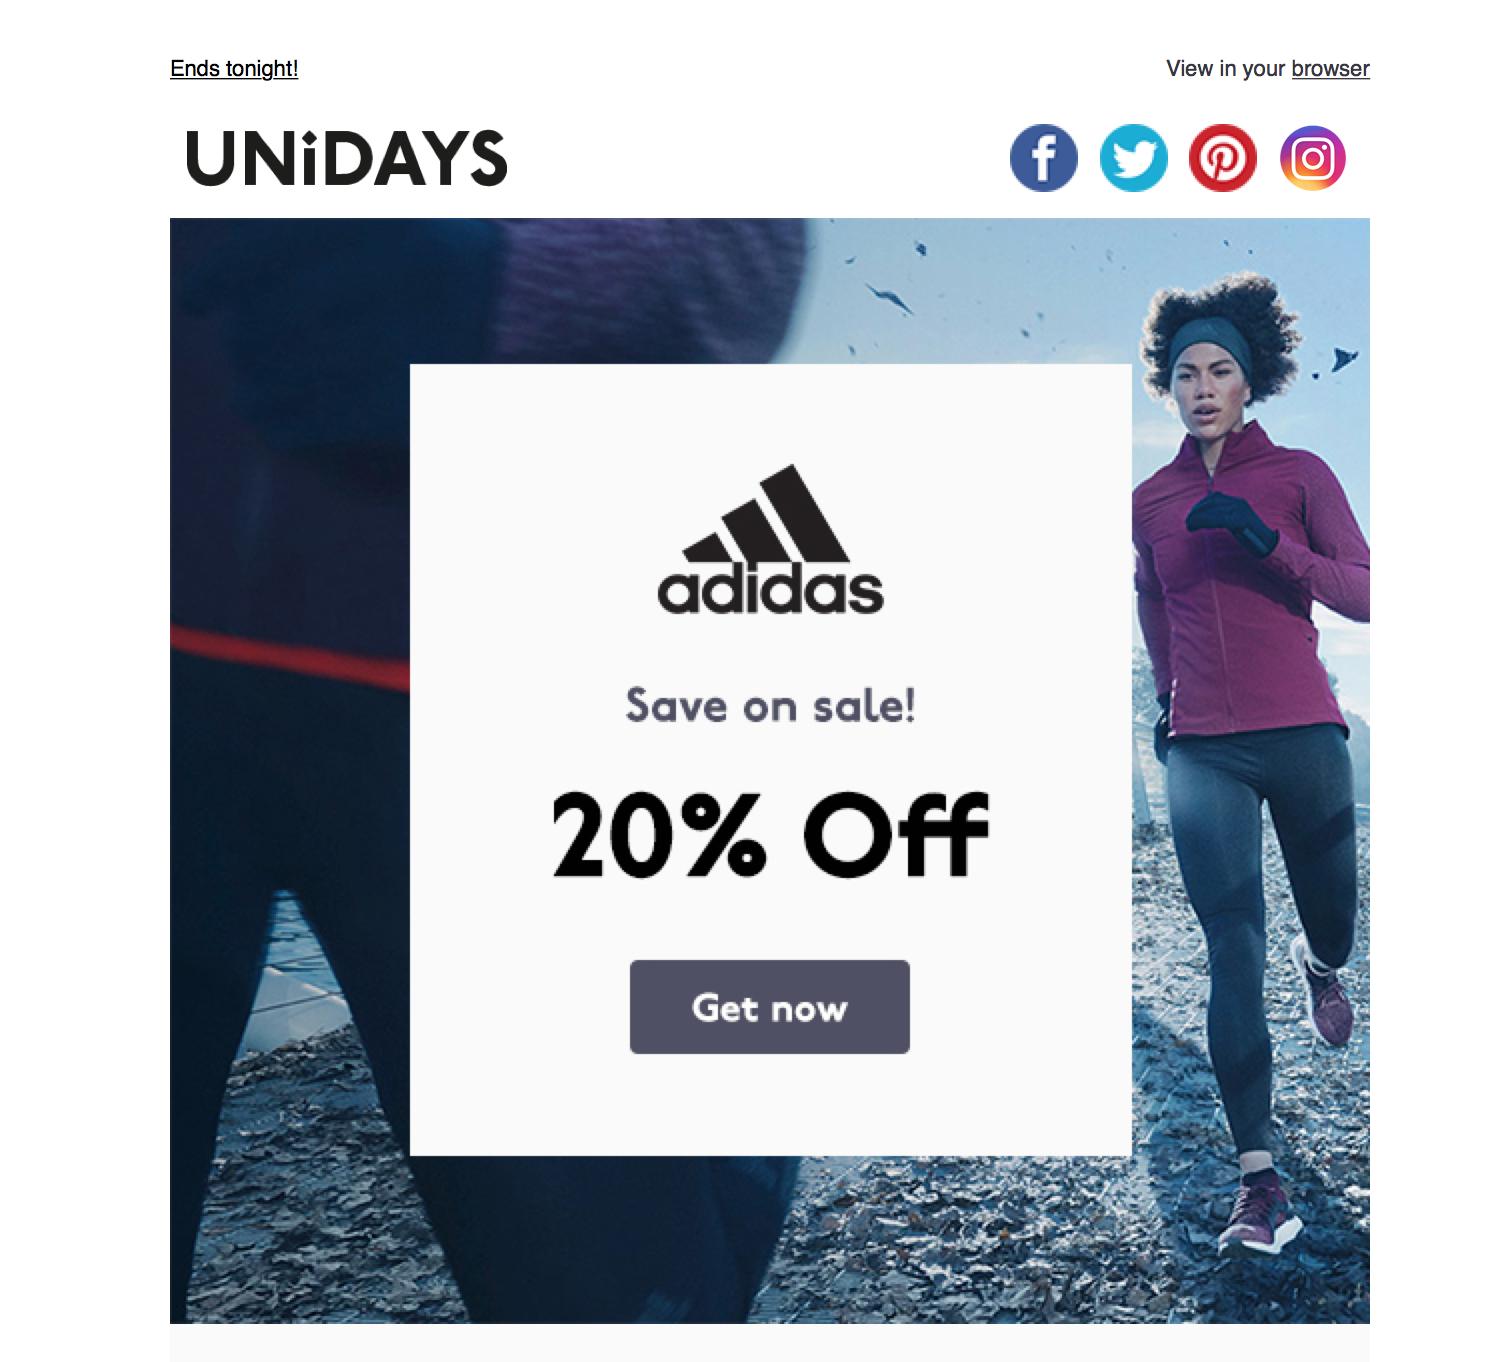 20% off @ Adidas via Unidays